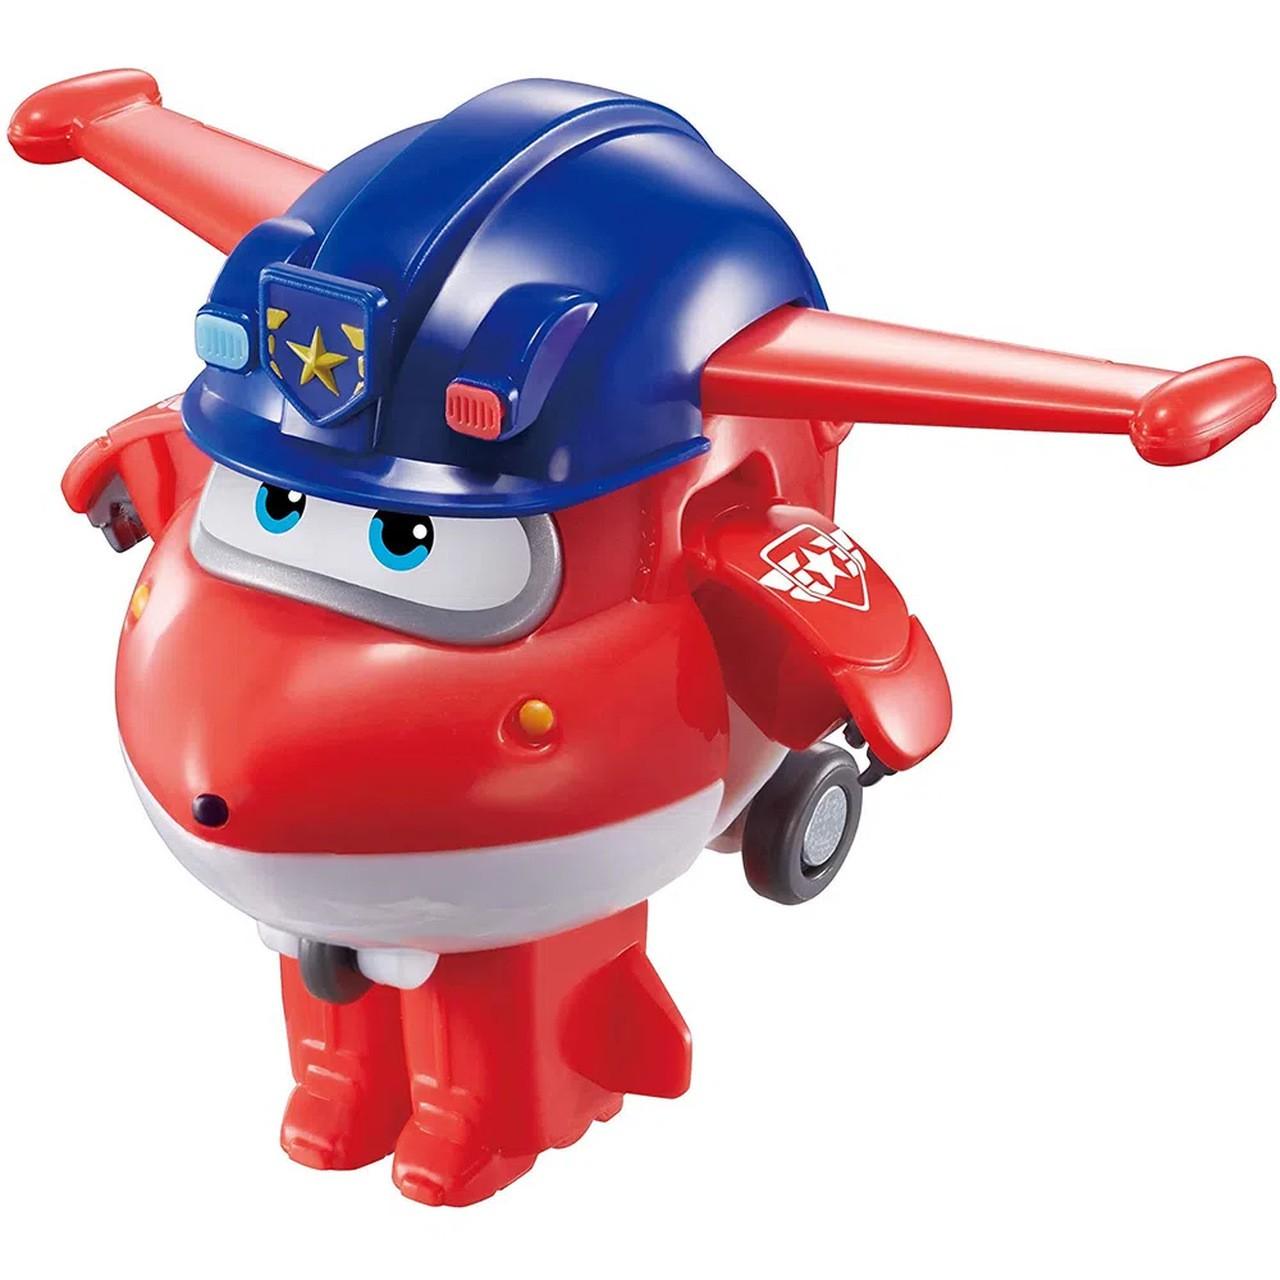 Super Wings Jett Policial - Boneco Transformável 6cm - Fun